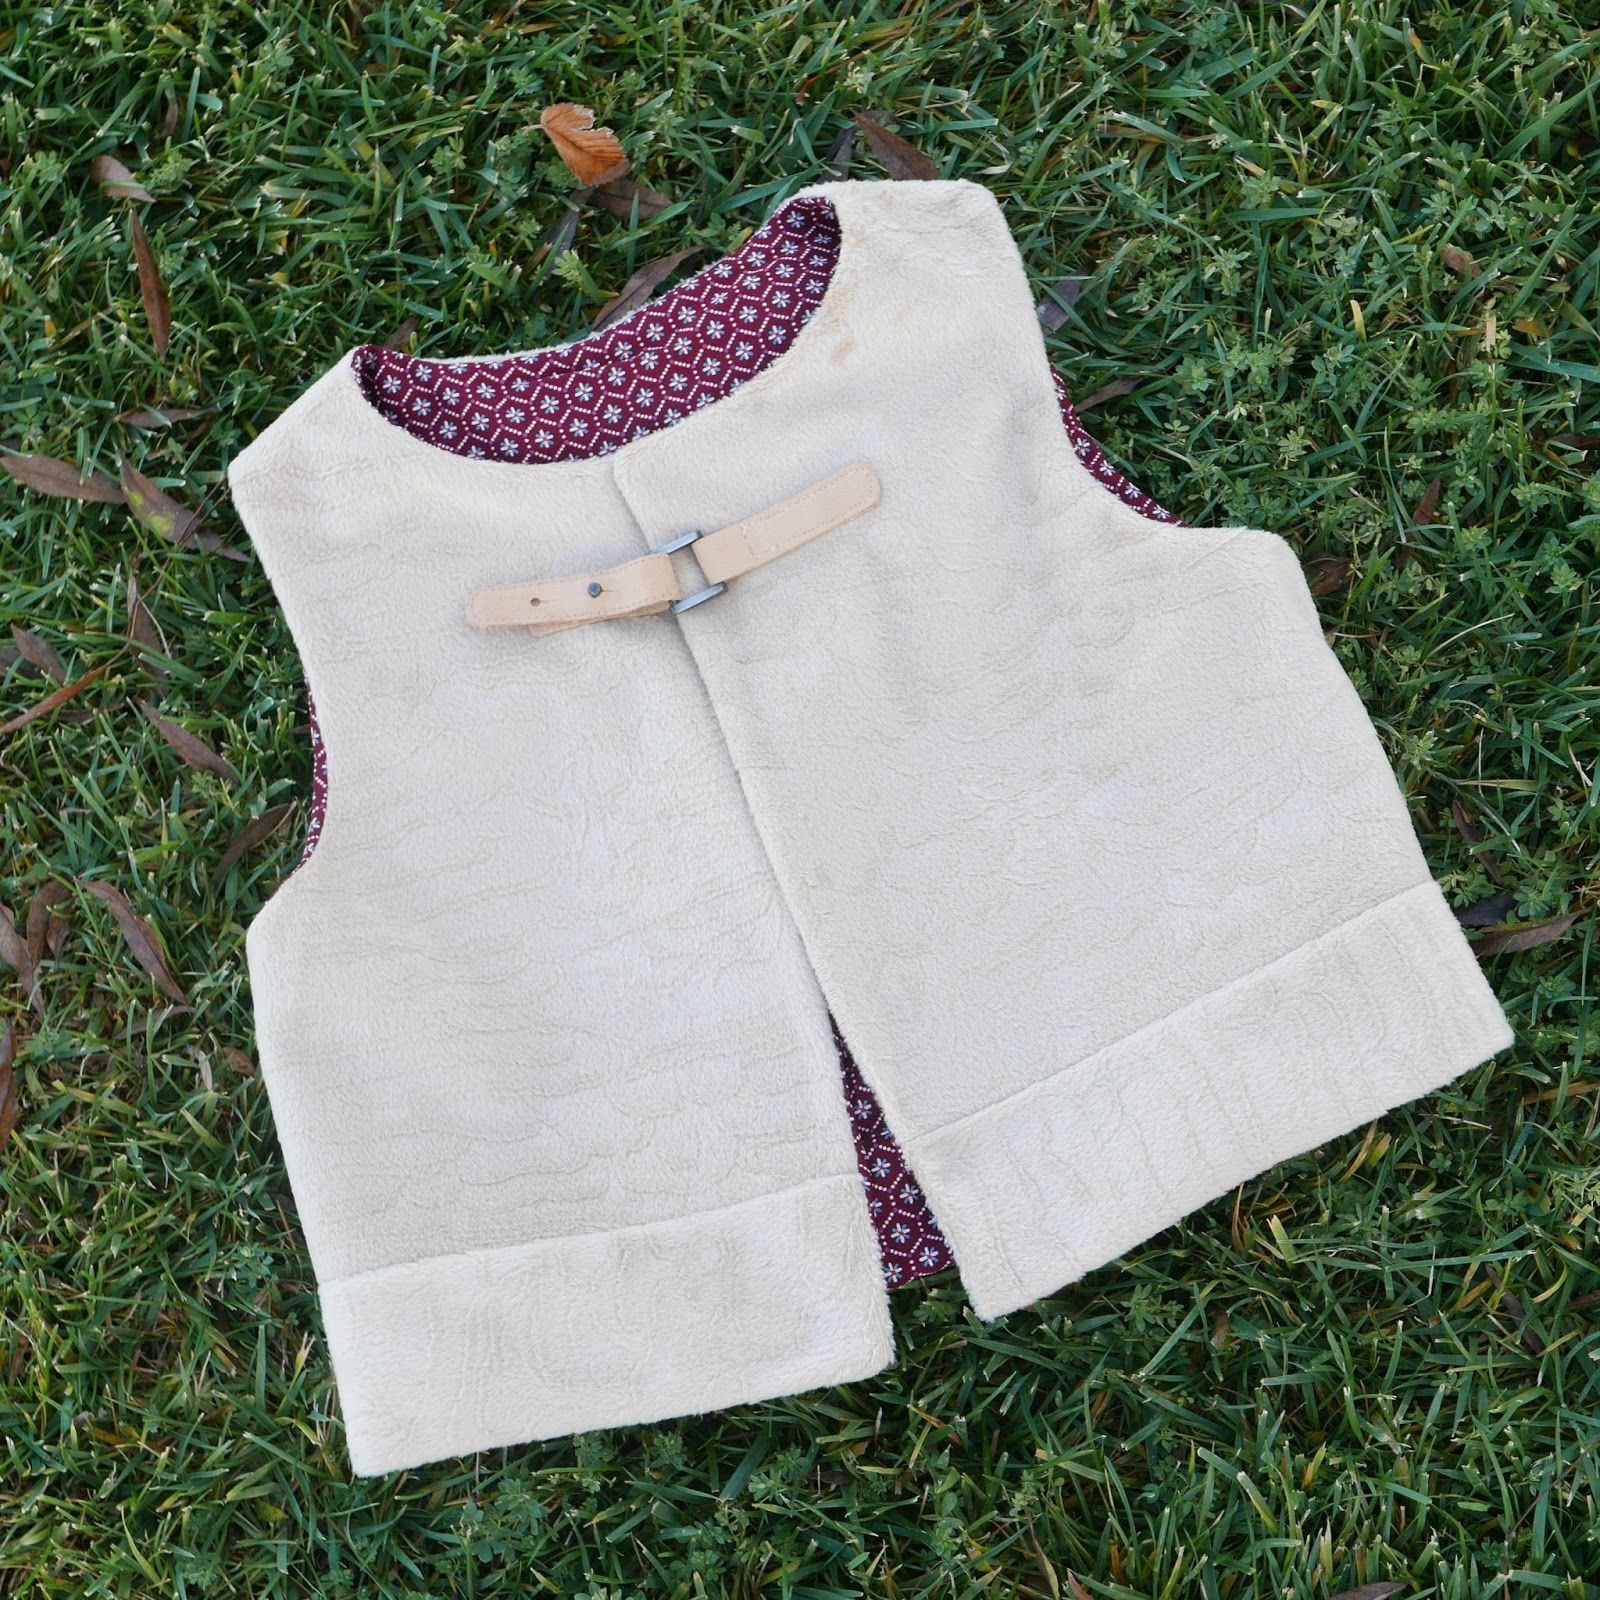 como hacer chaleco reversible | Tutoriales | Pinterest | Costura ...